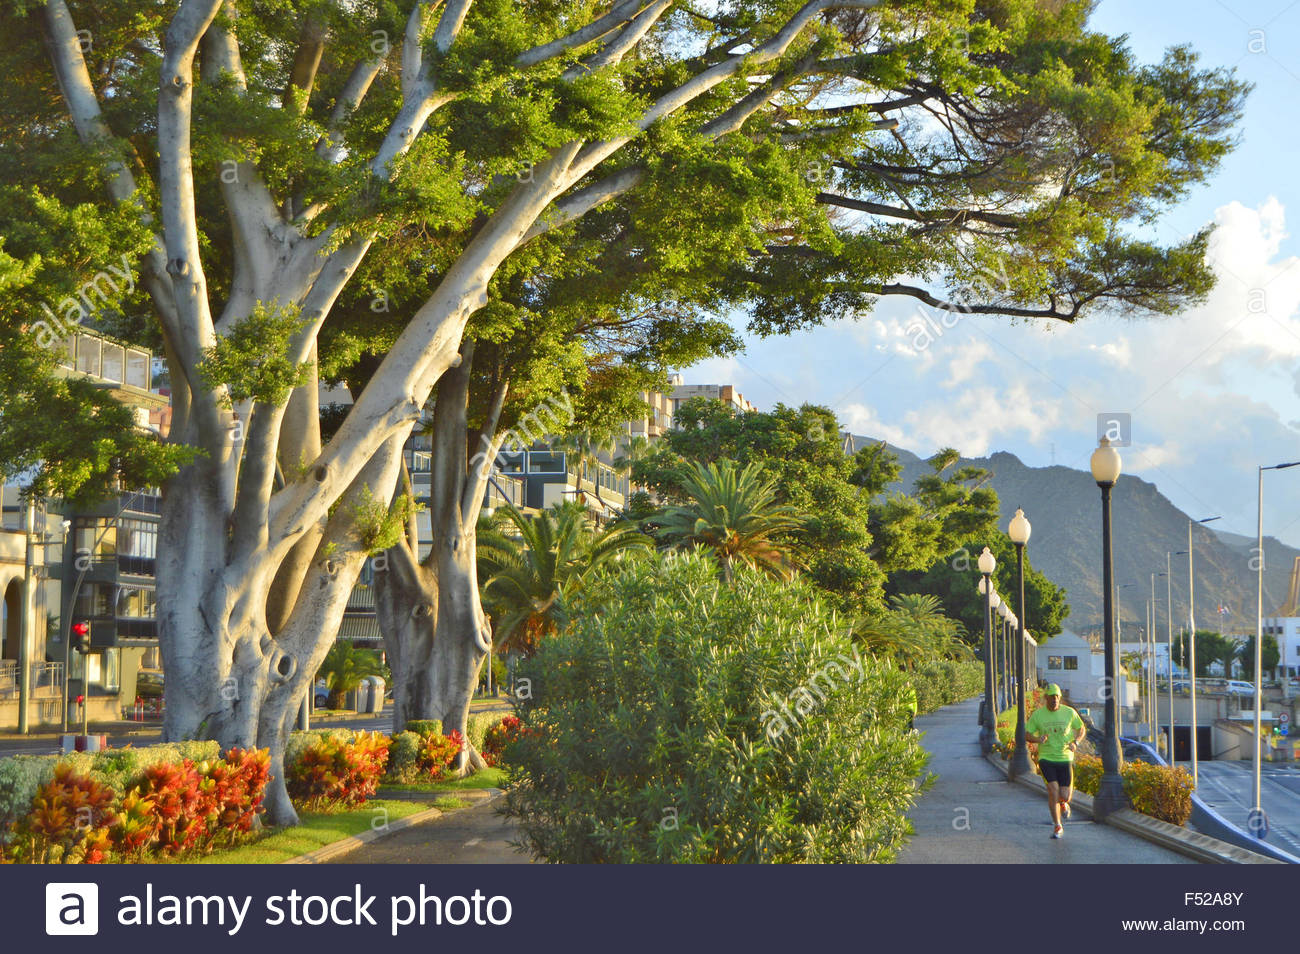 Harbor promenade alley of evergreen trees in Santa Cruz De Tenerife Canary Islands Spain. It enjoys mild climate - Stock Image